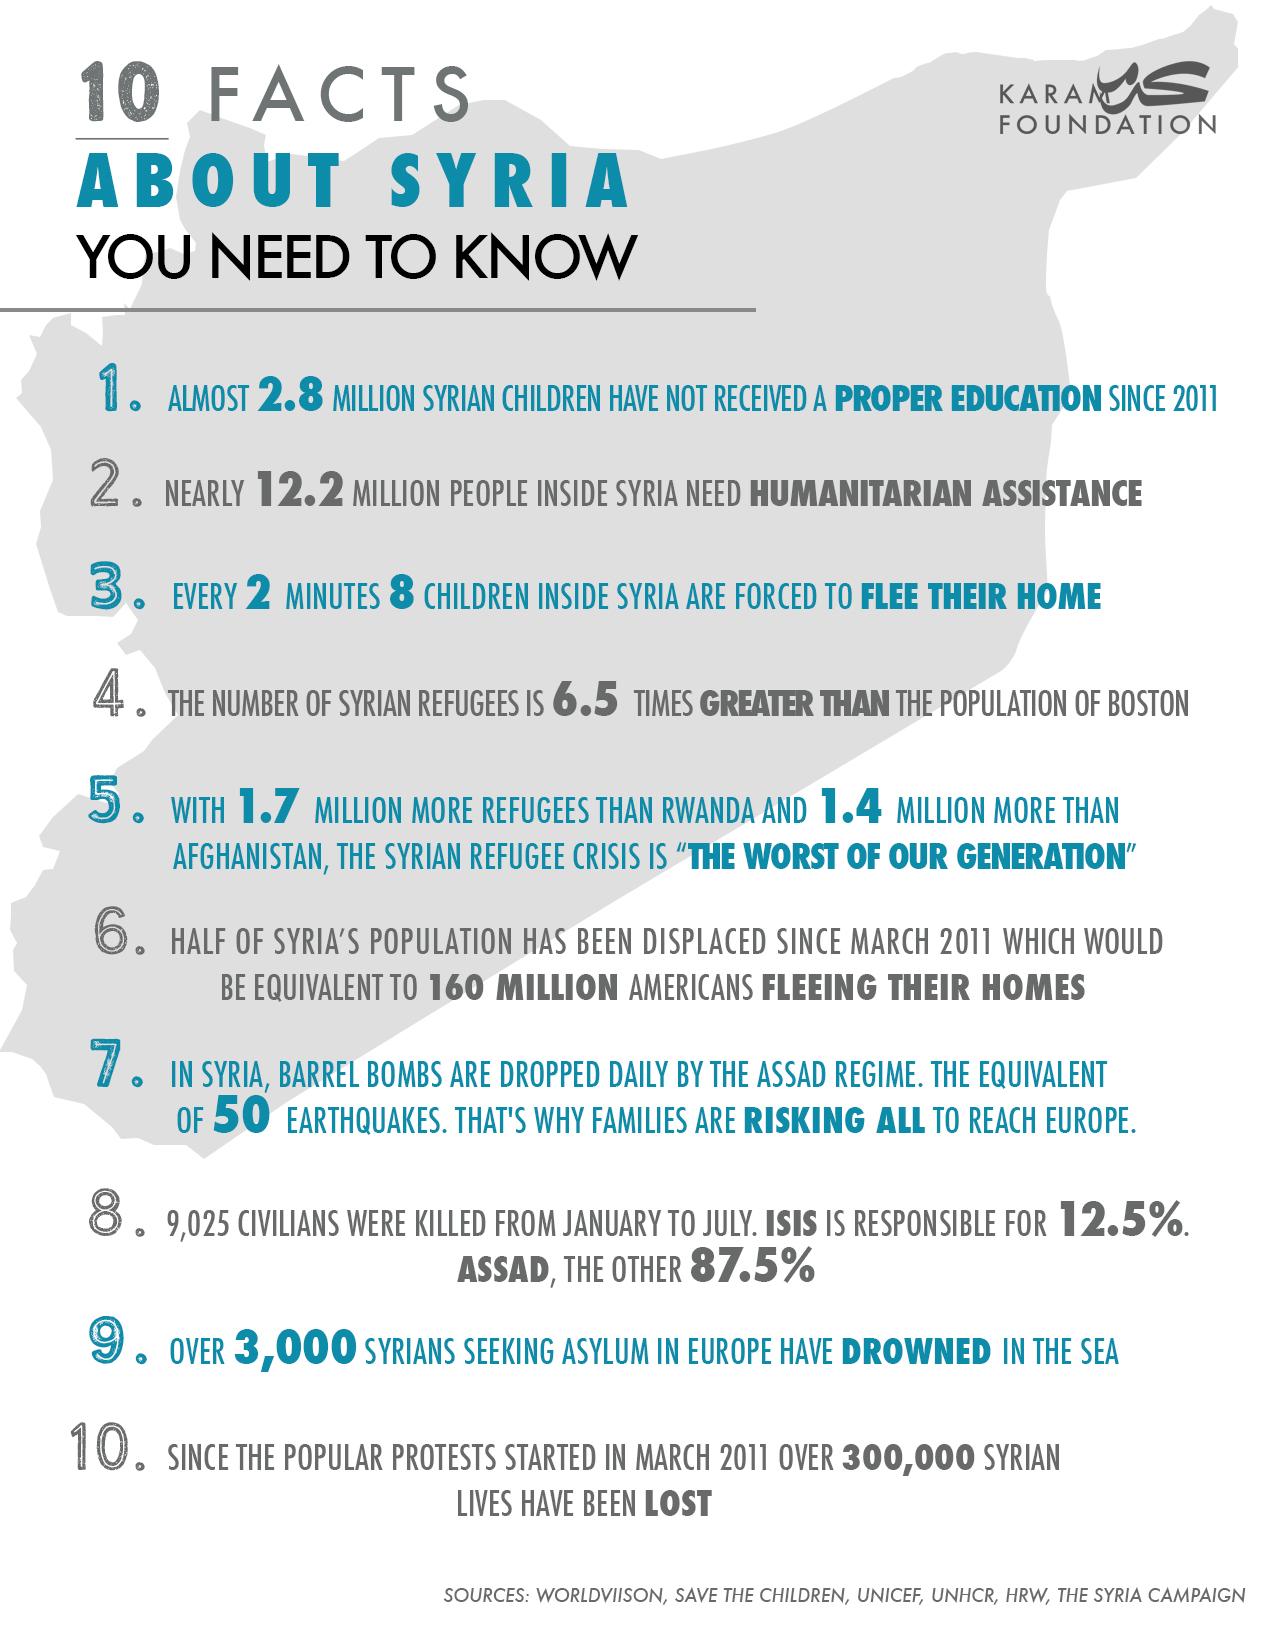 Photo credit:  Karam Foundation Fact Sheet.